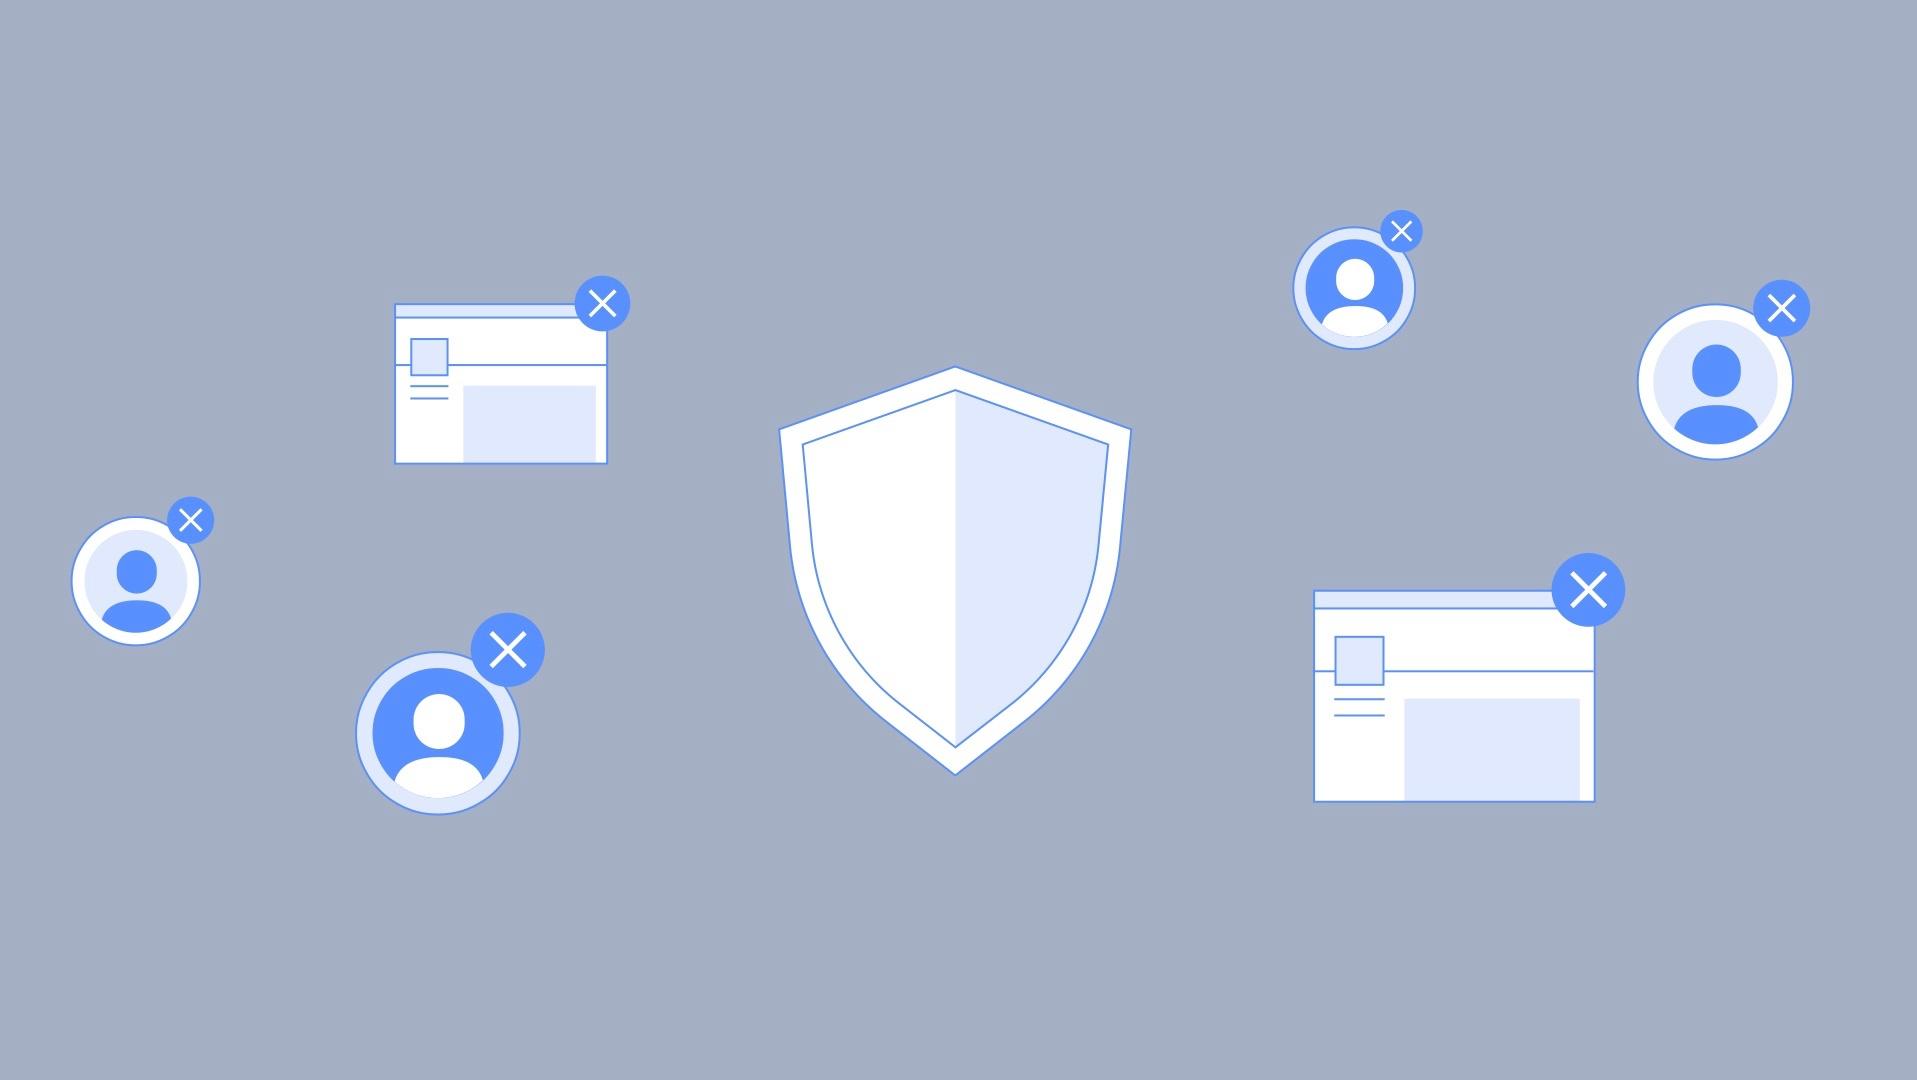 facebook-app-account-removal-tesla-tech-news